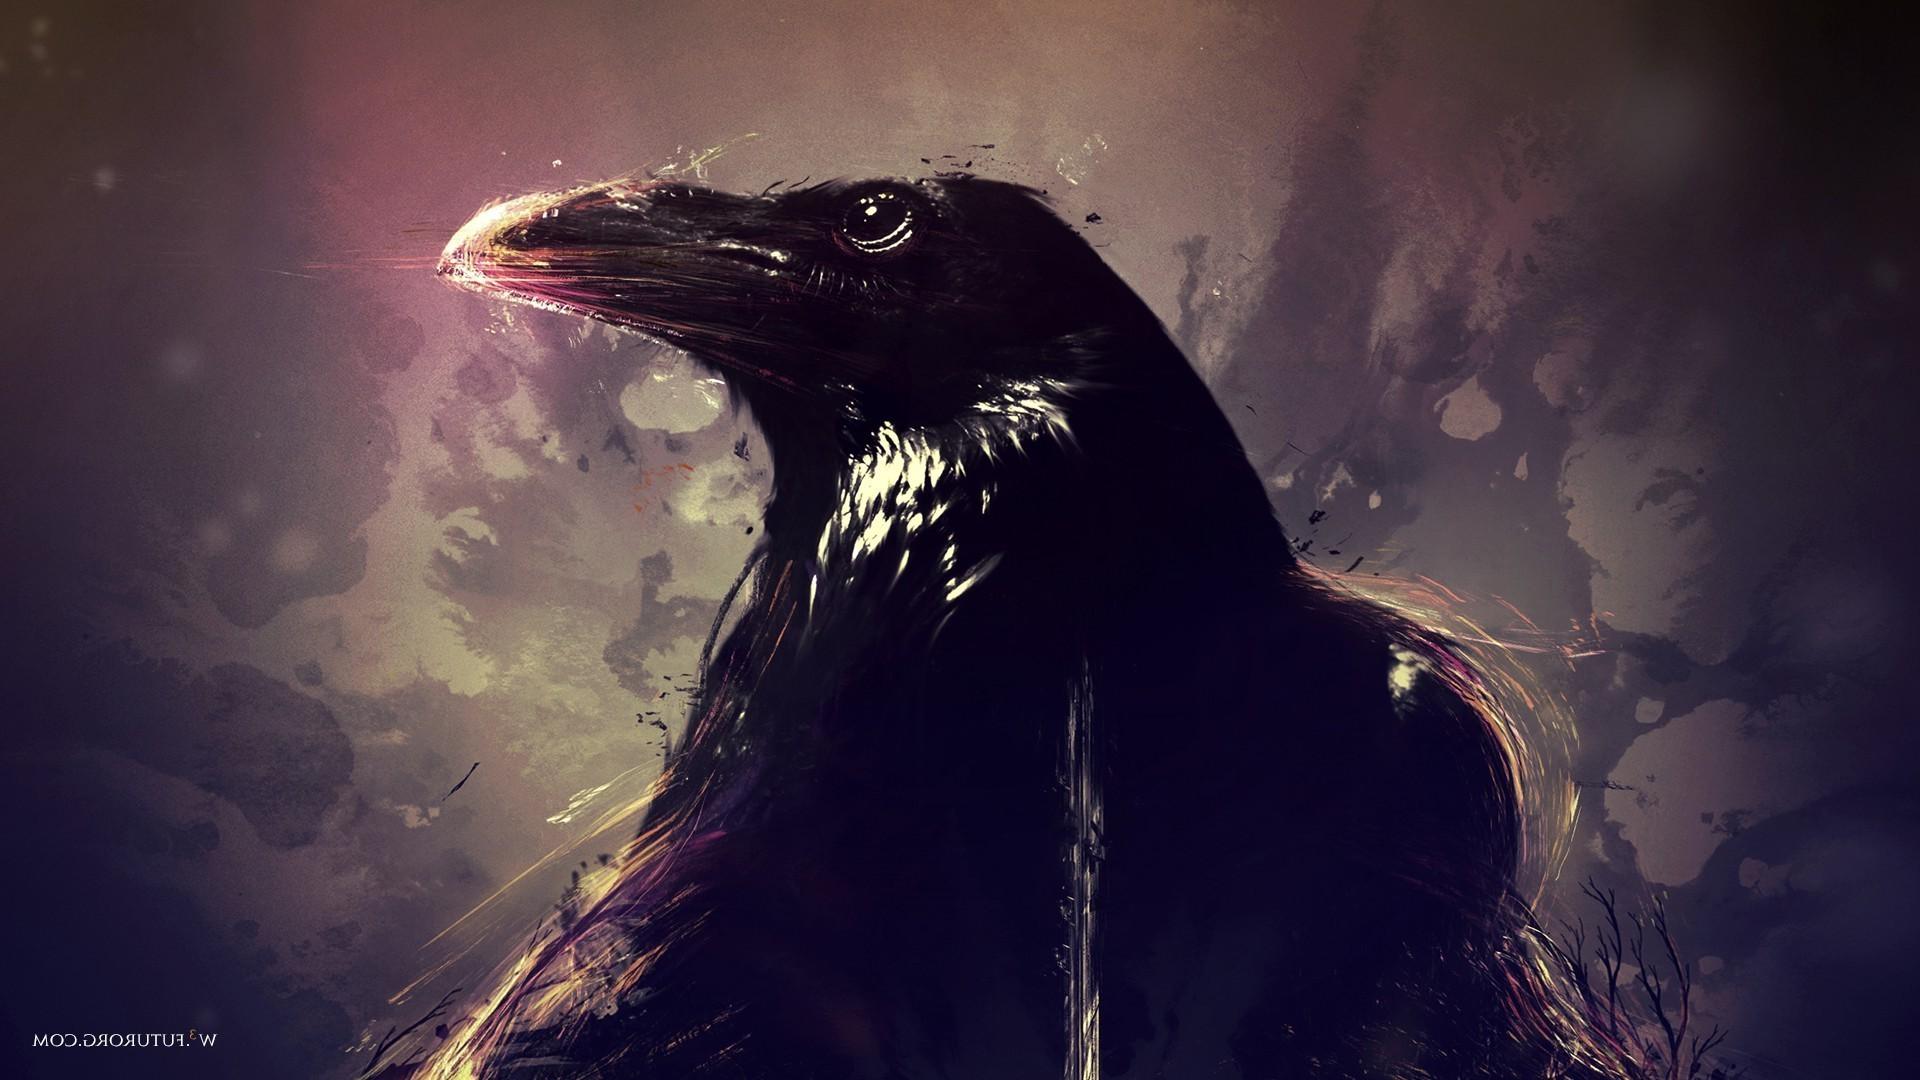 1920x1080 Raven Artwork Animals Birds Wallpaper HD